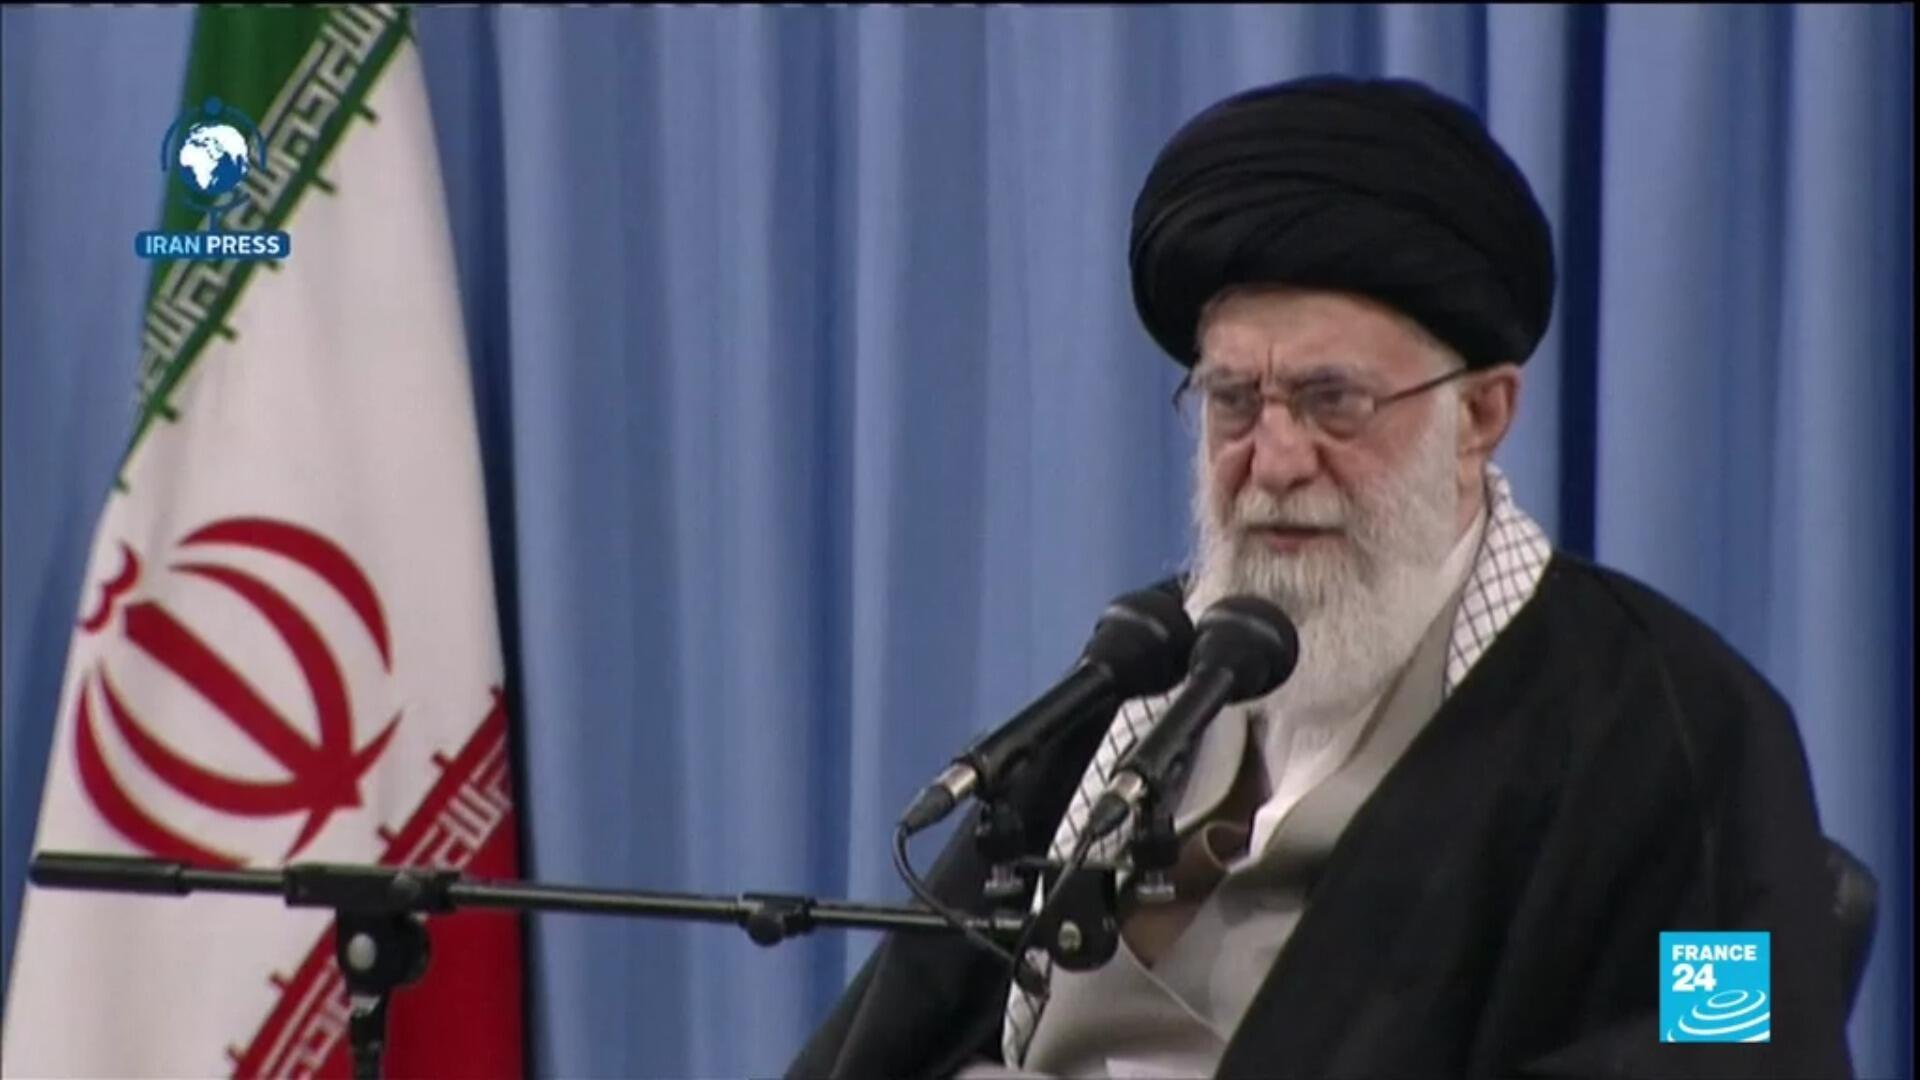 Iranian Supreme Leader Ayatollah Ali Khamenei speaks on public television after missile strikes on US bases in Iraq.